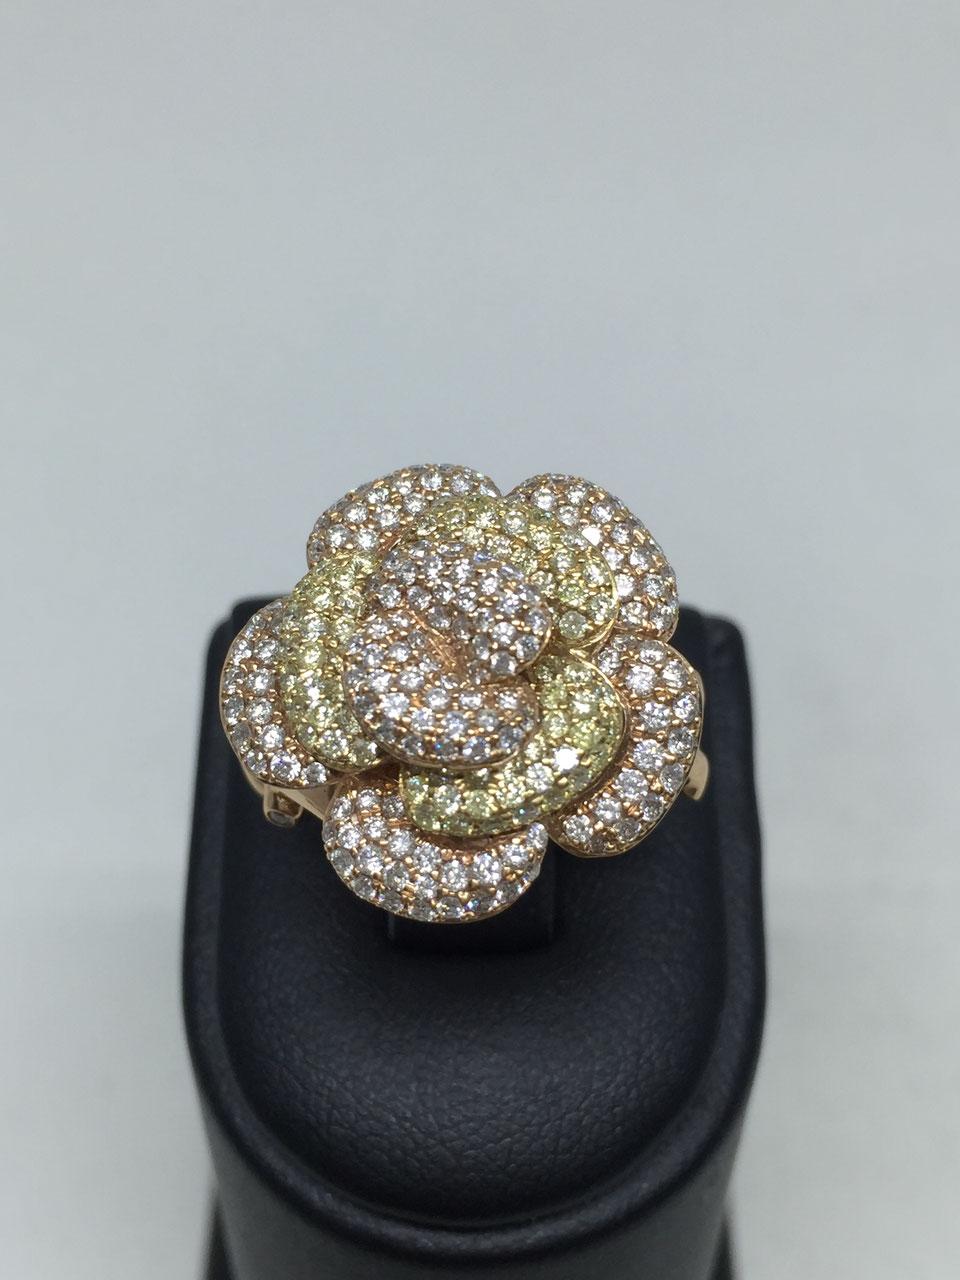 xavier penichot bijoux paris